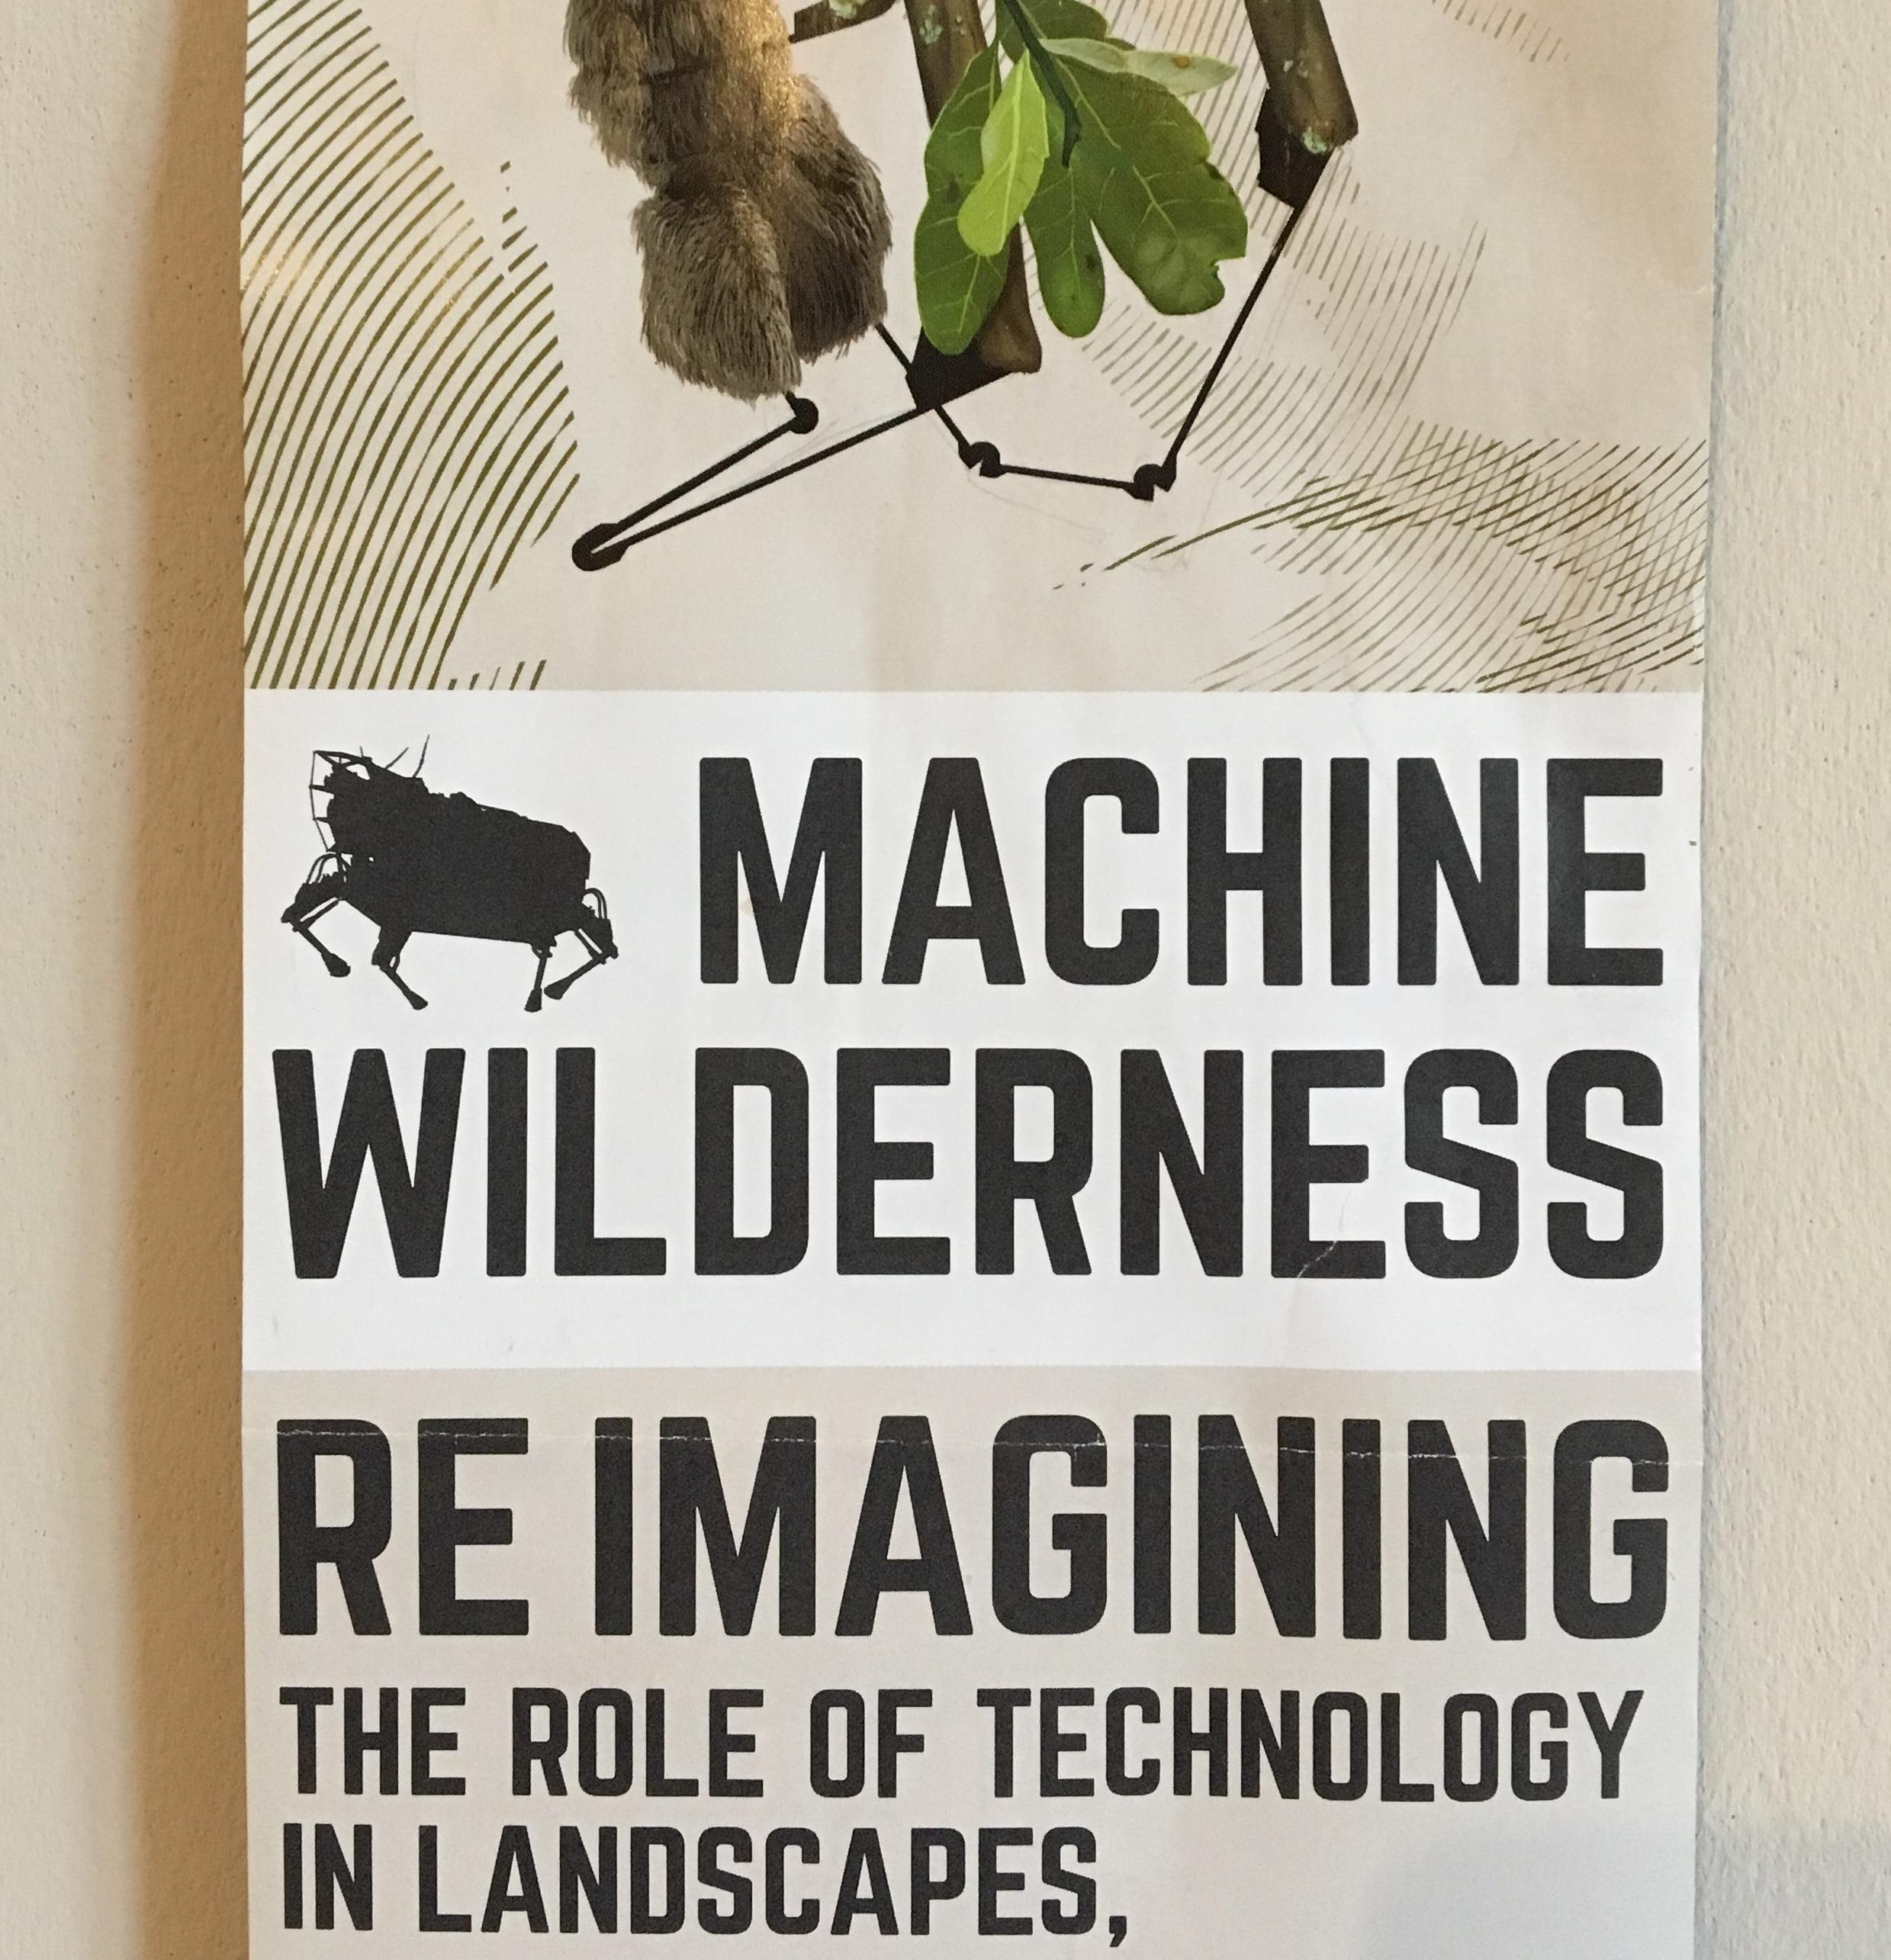 MachineWilderness.jpg